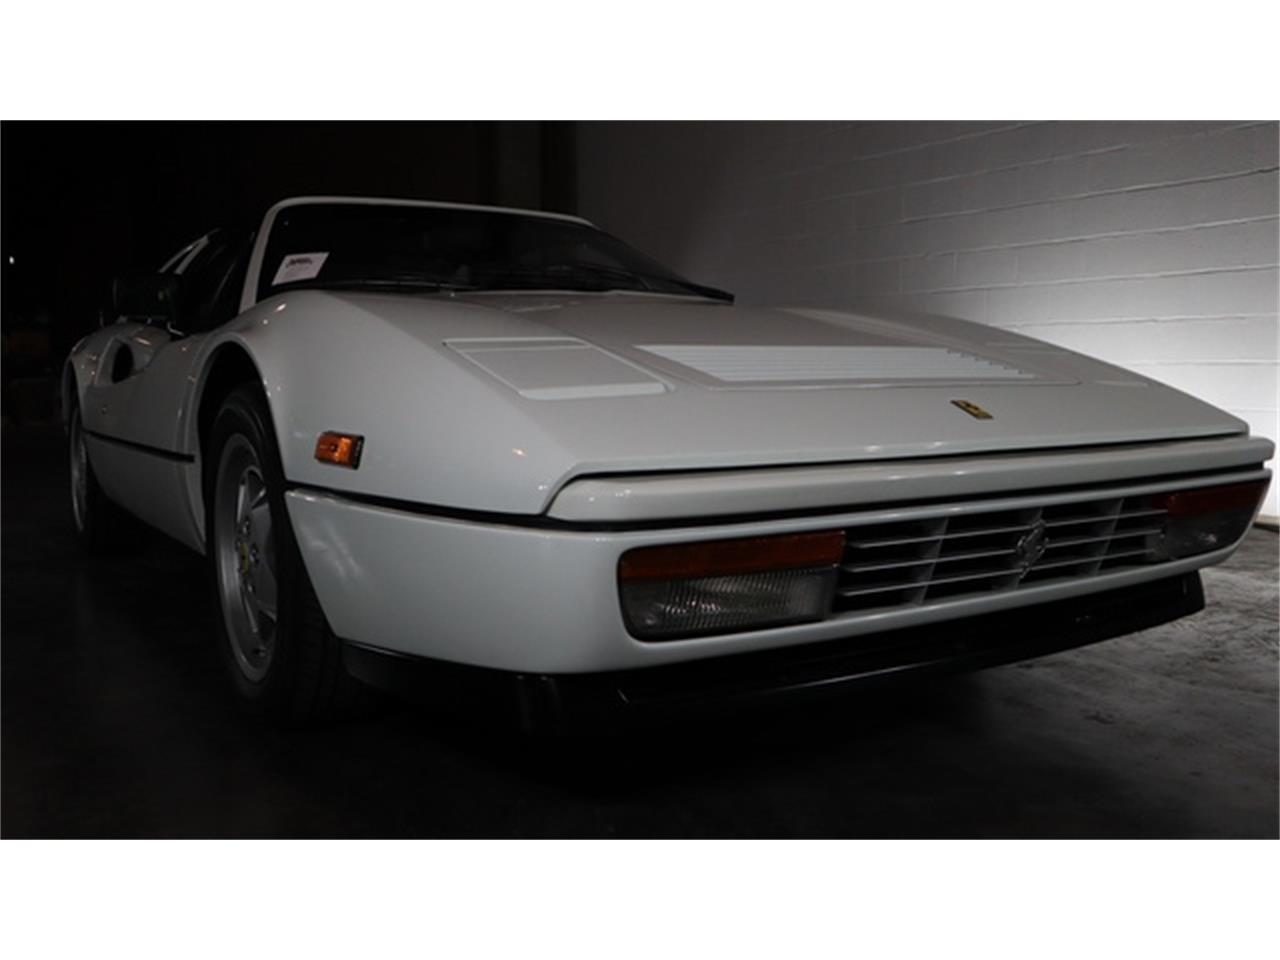 1988 Ferrari 328 (CC-1386933) for sale in Online, Mississippi